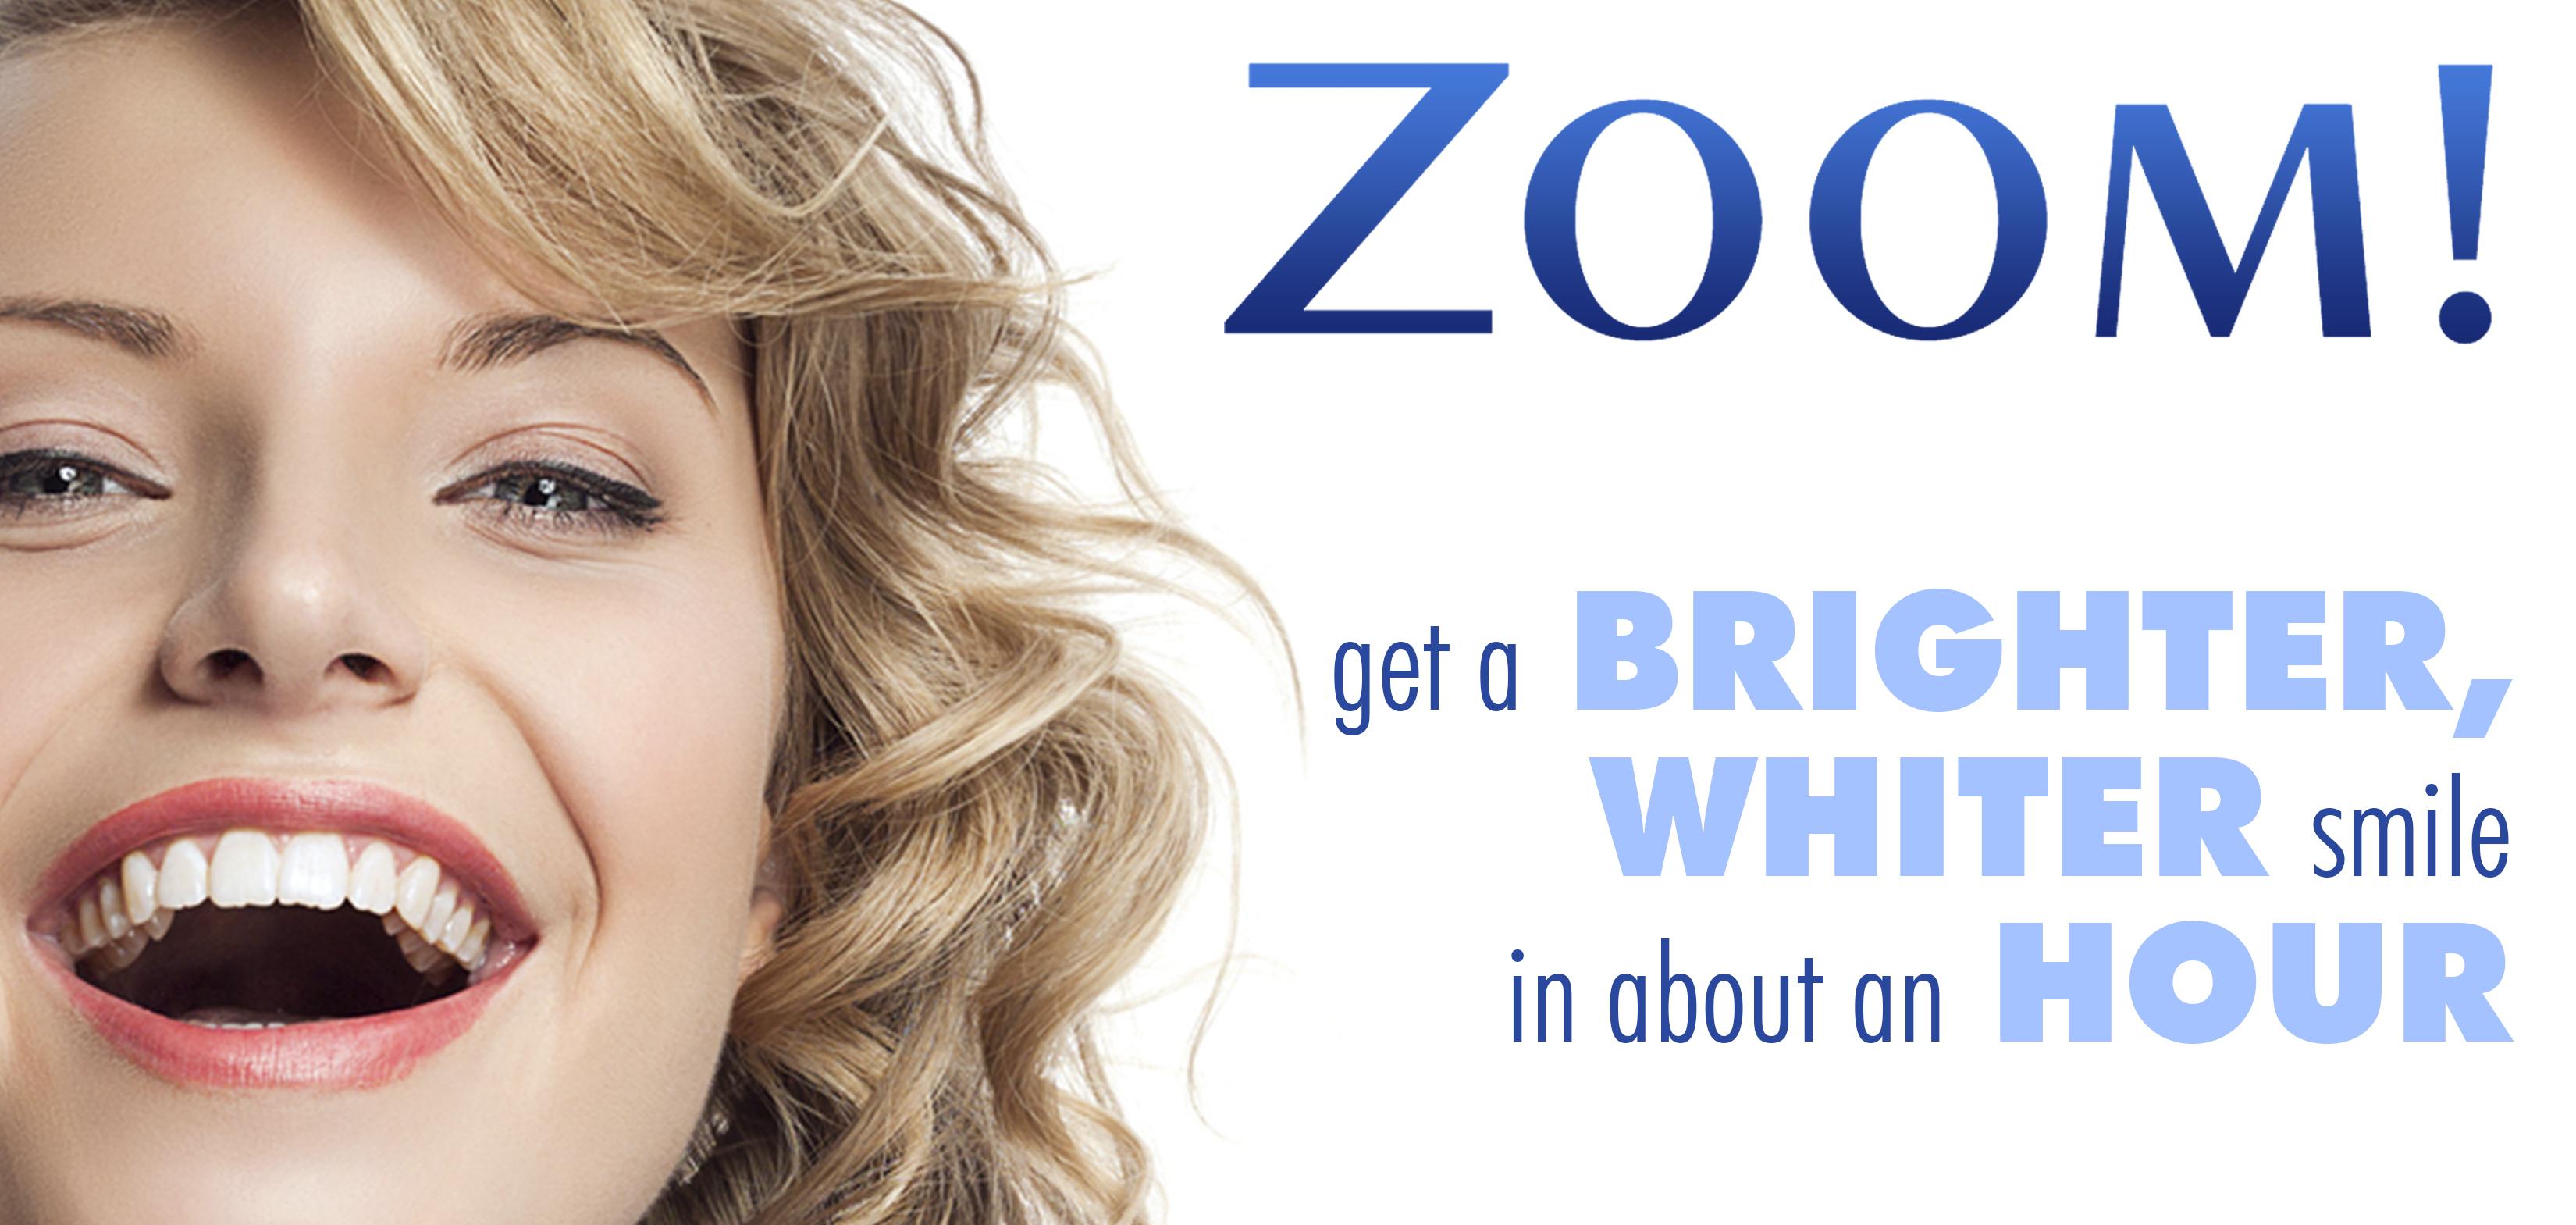 Zoom light teeth whitening